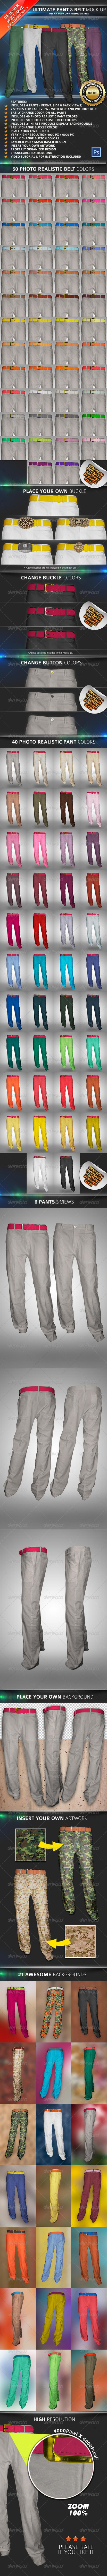 Pant and Belt Mock-Up - Apparel Product Mock-Ups